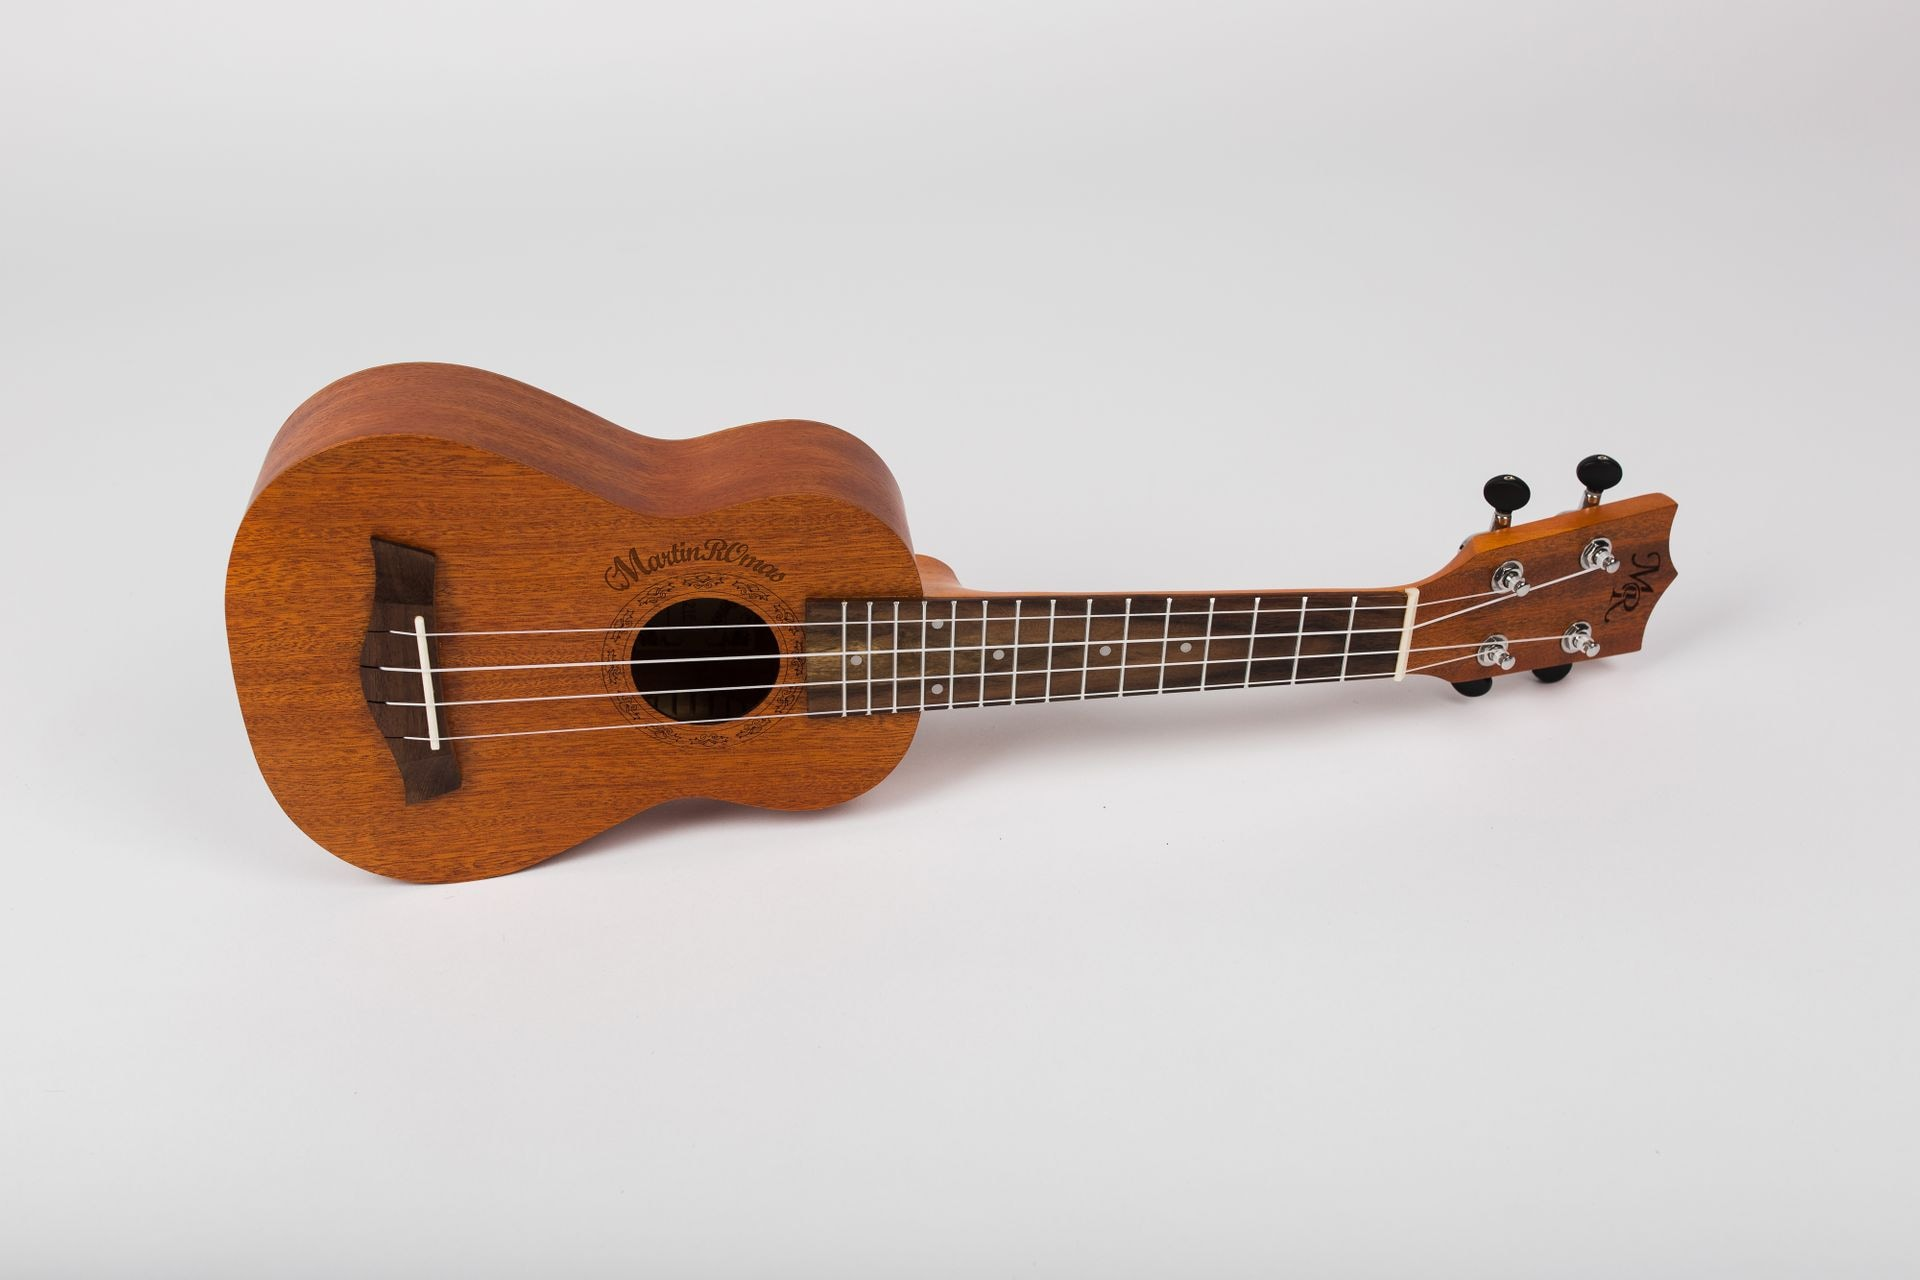 Как играть на укулеле - wikihow